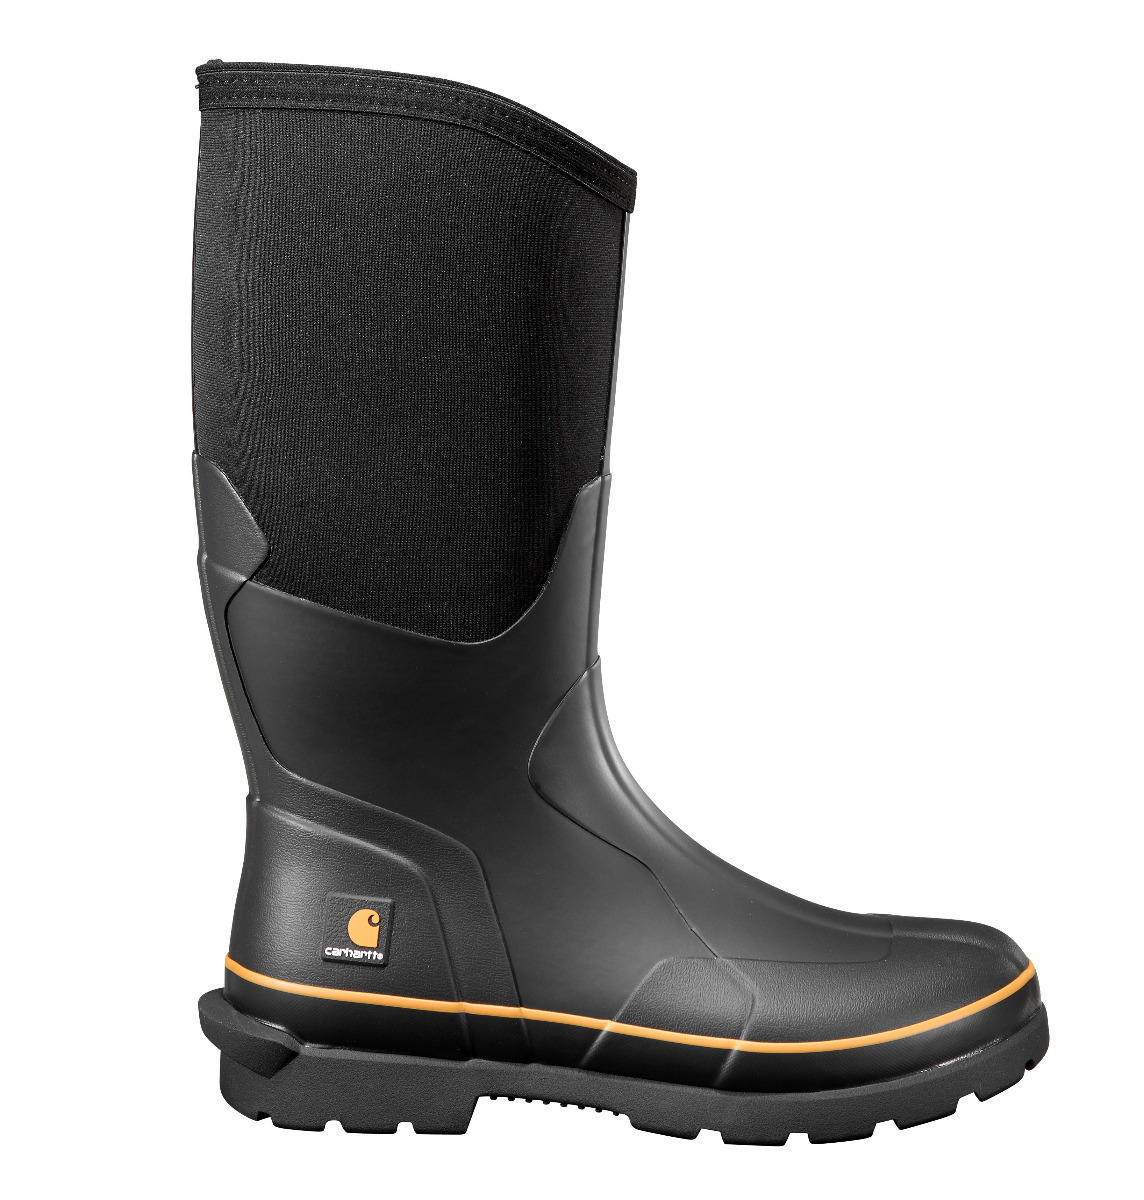 Carhartt Mudrunner 15-Inch Carbon Nano Toe Rubber Boot